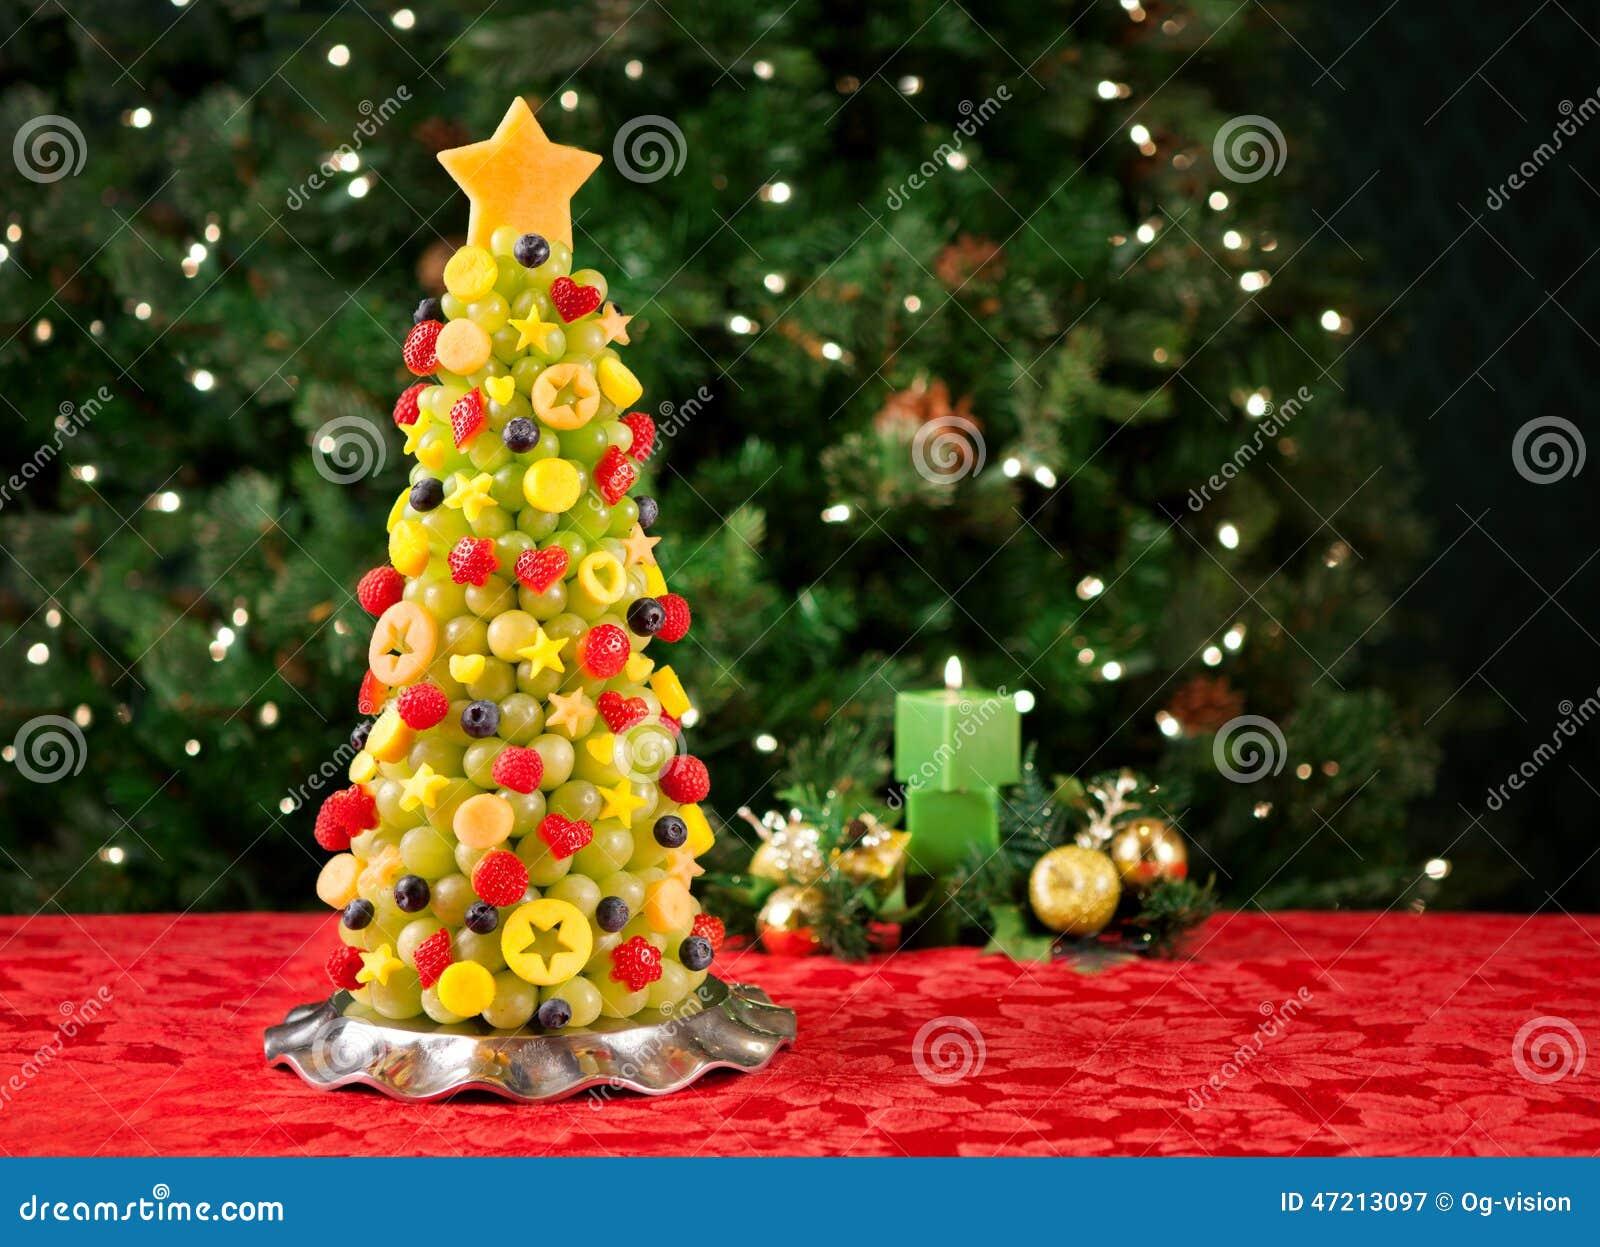 Christmas Tree Fruit.Fruit Christmas Tree Stock Image Image Of Food Tree 47213097